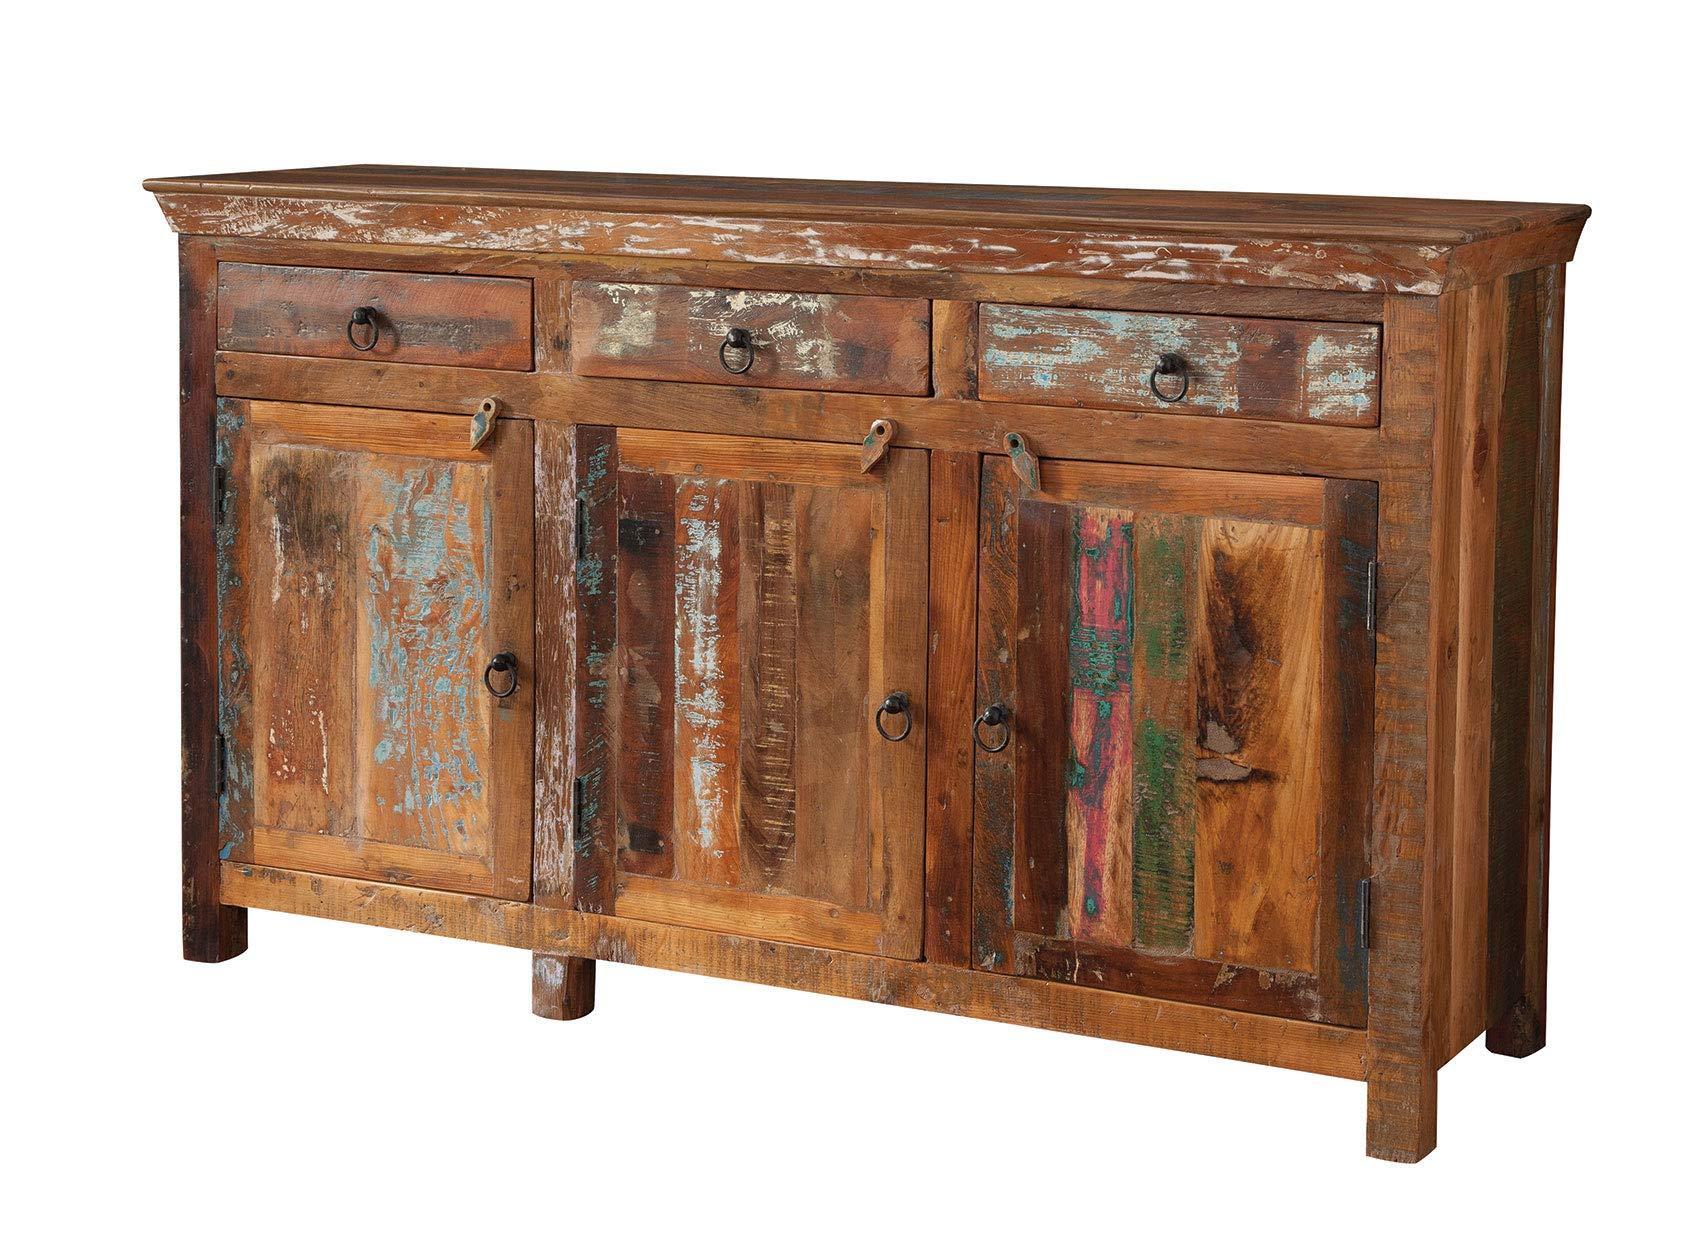 Coaster Home Furnishings 3-door Accent Cabinet Reclaimed Wood by Coaster Home Furnishings